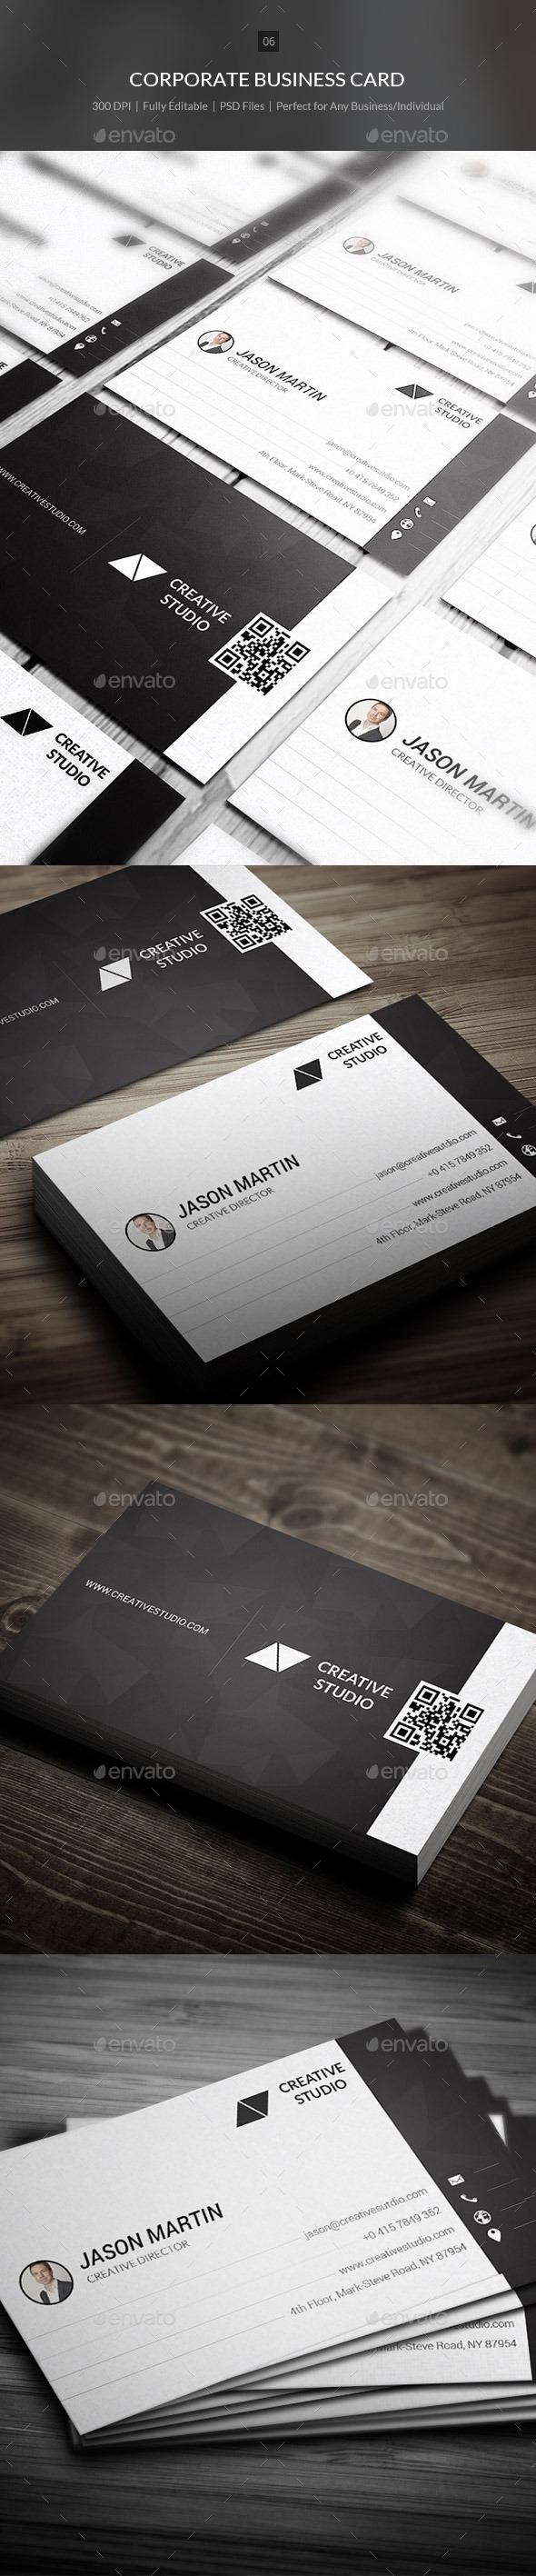 Corporate Business Card - 06 - Corporate Business Cards